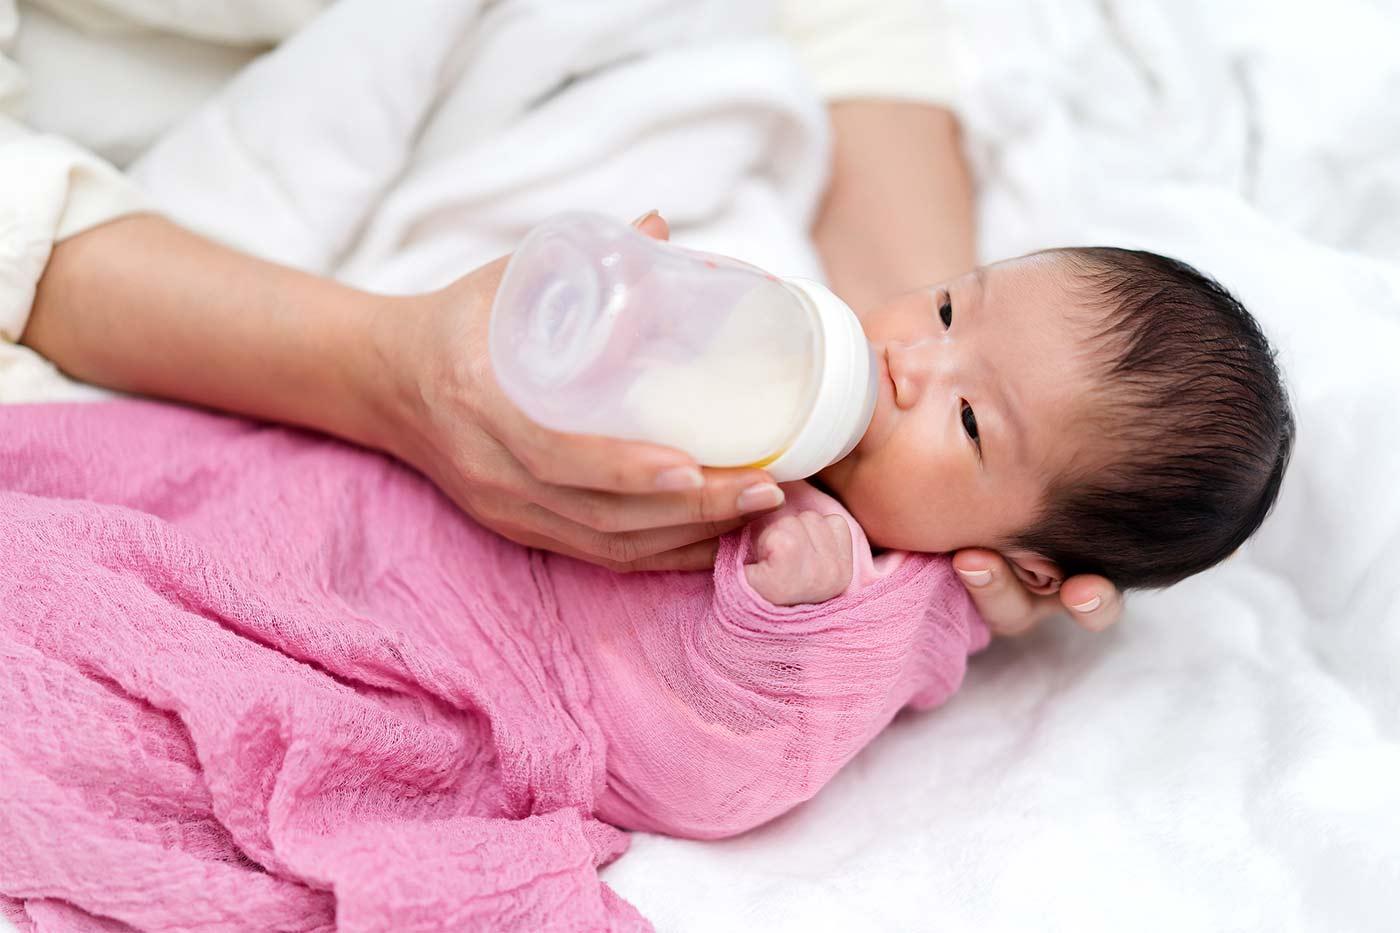 Newborn Feeding Every 2 Hours